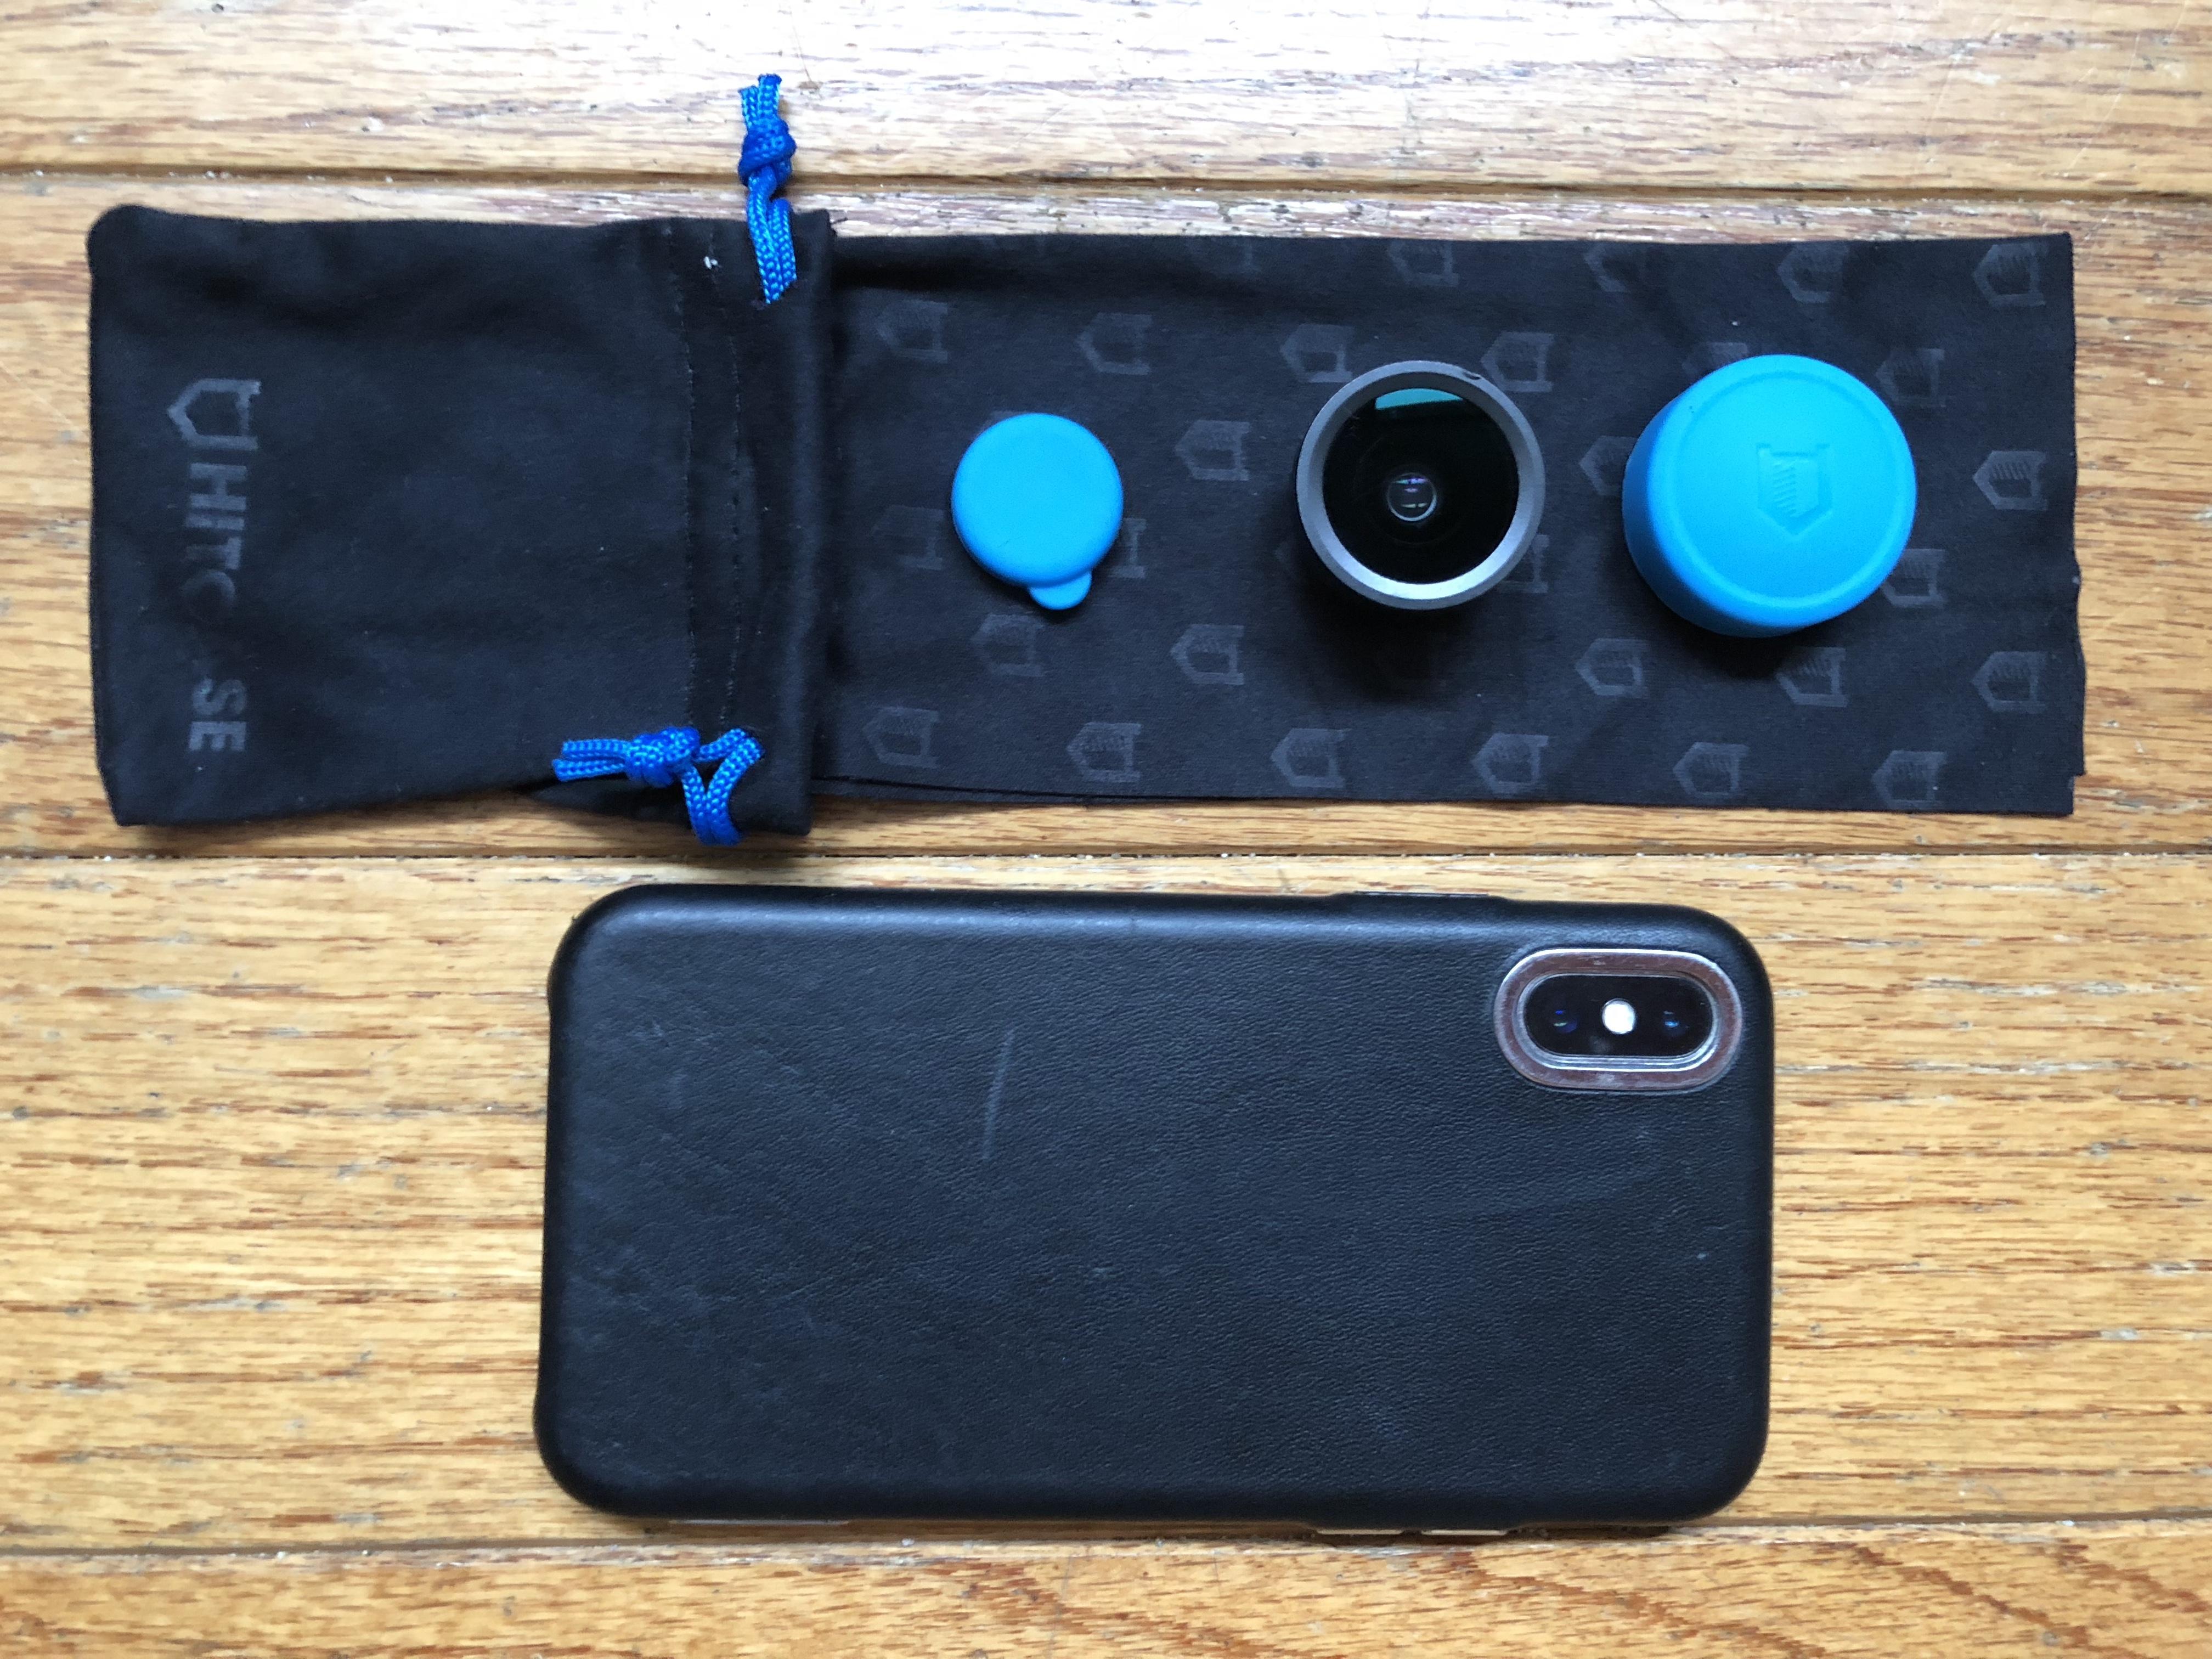 Hitcase Ferra iPhone Case Review